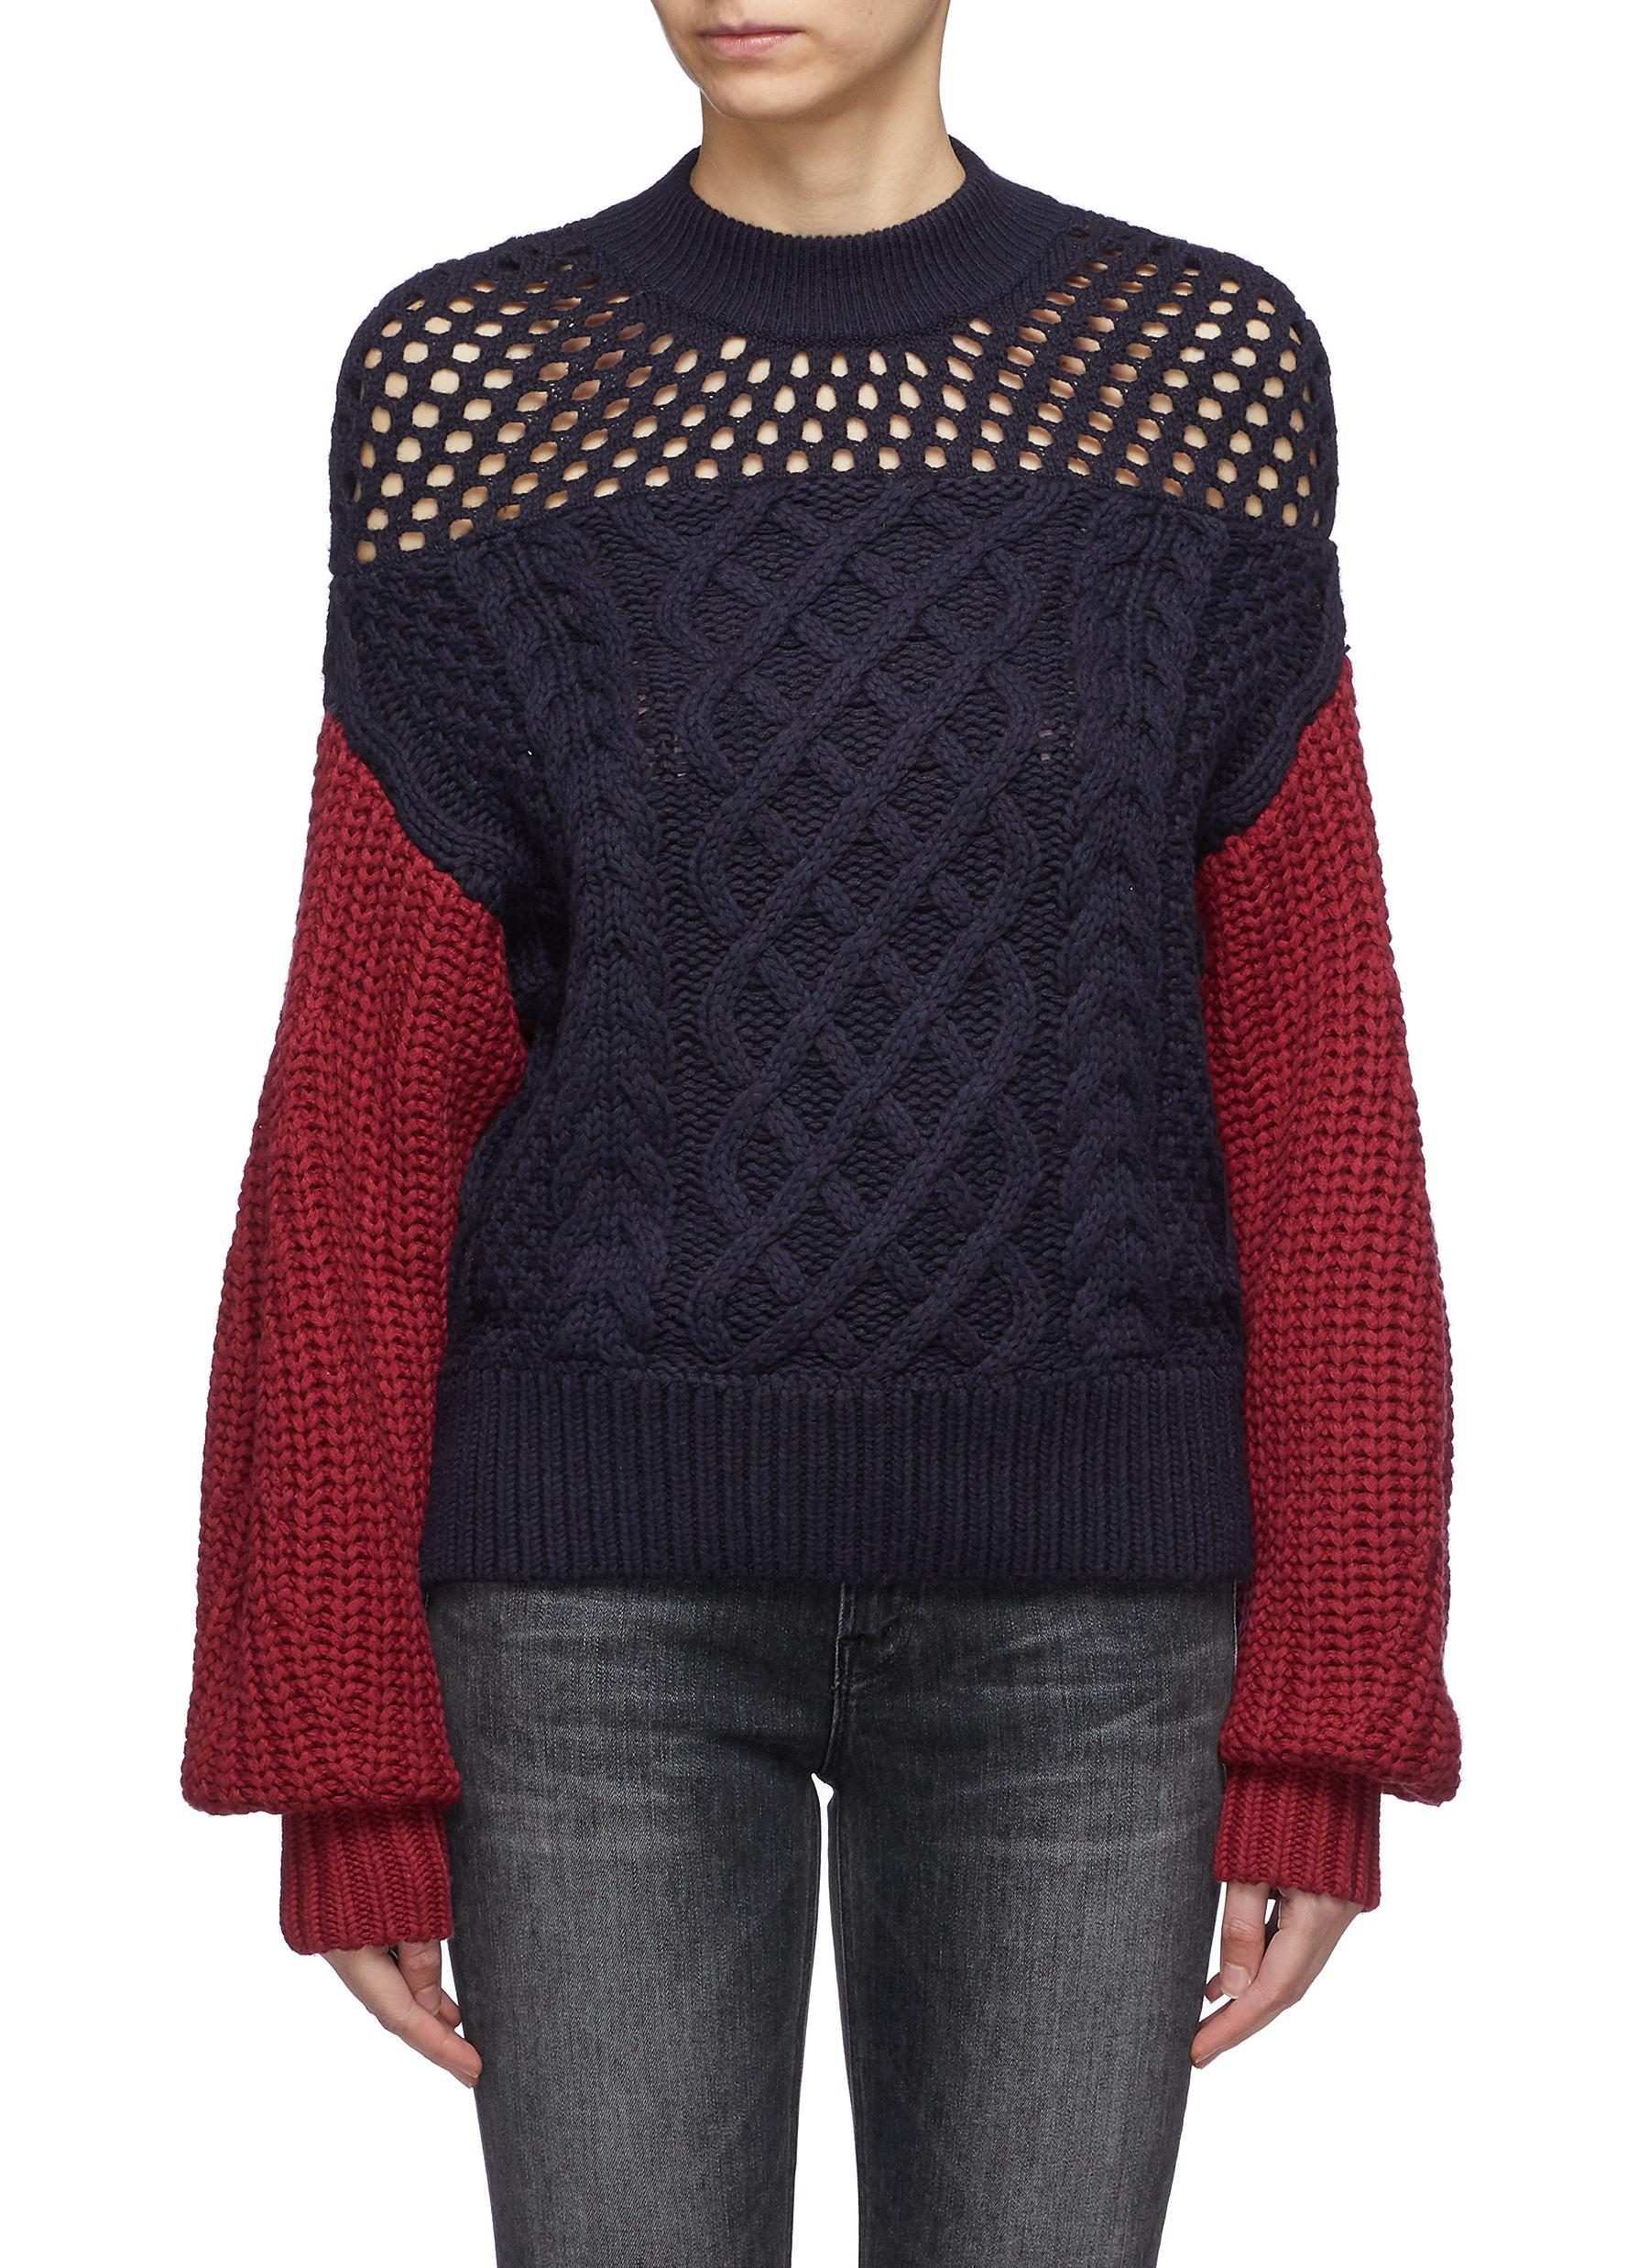 Colourblock cotton-wool mix knit sweater by Self-Portrait